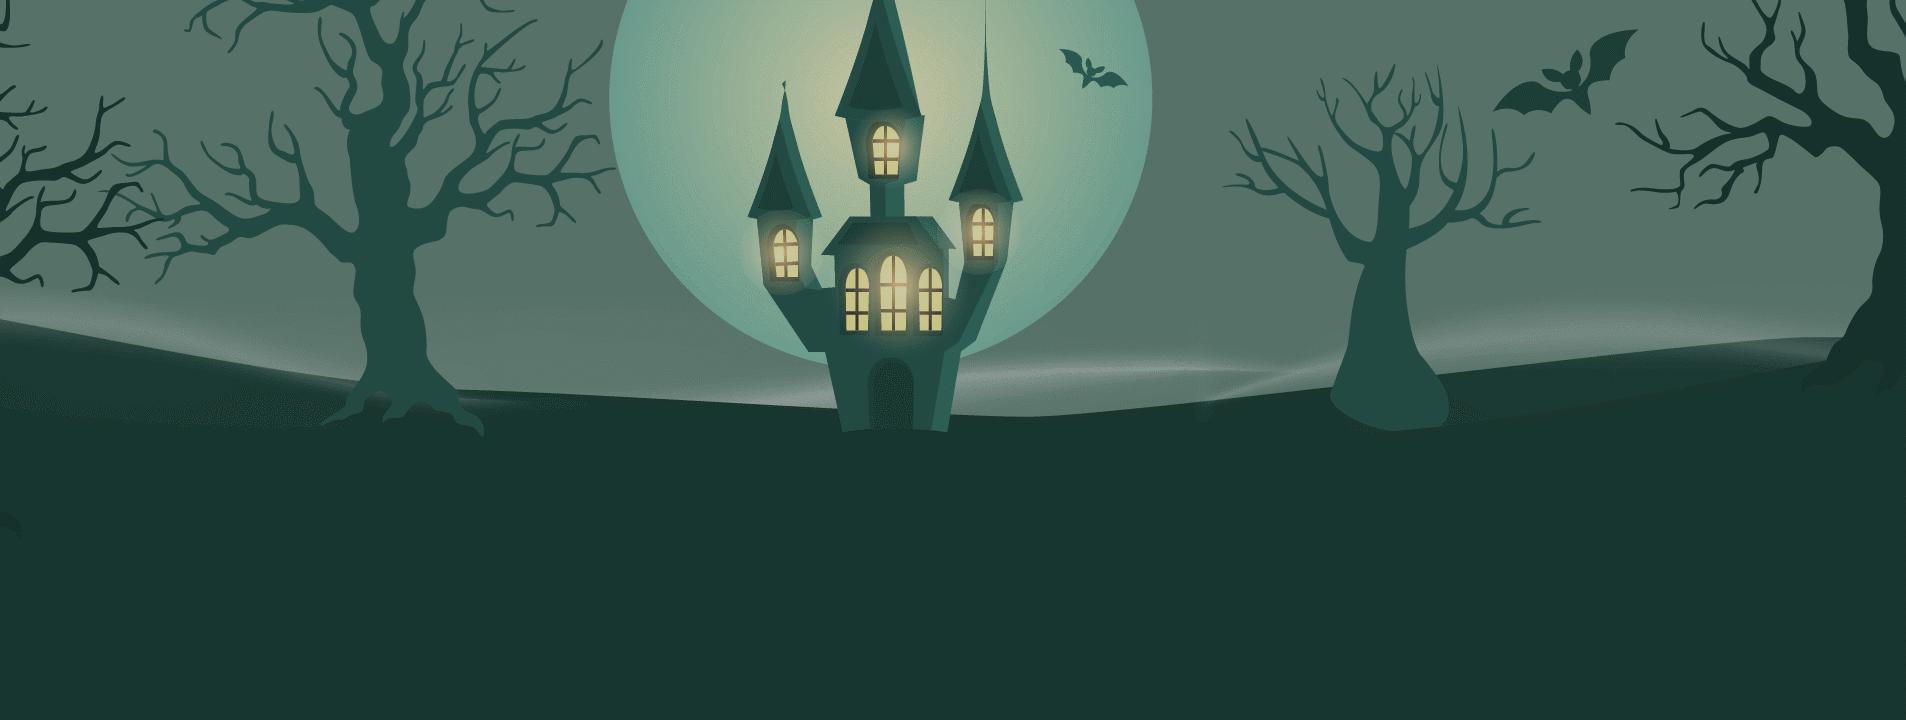 Arc halloween background 2021 v5